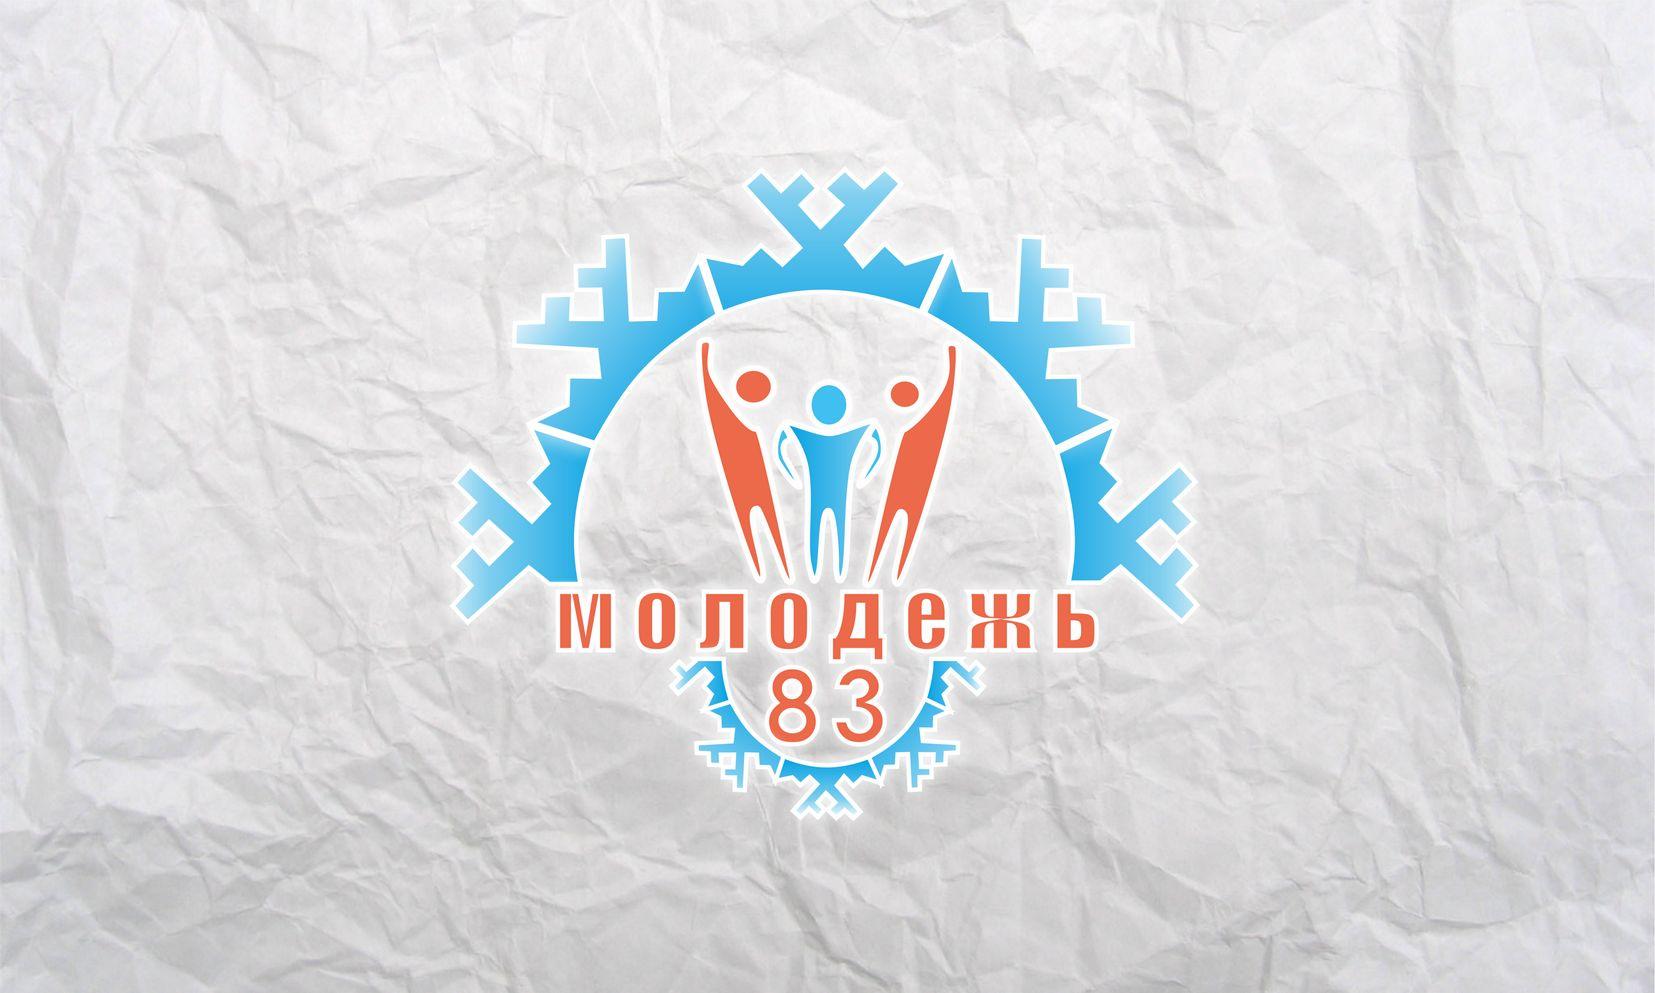 Логотип Моложедь Ненецкого автономного округа - дизайнер IsackovAl